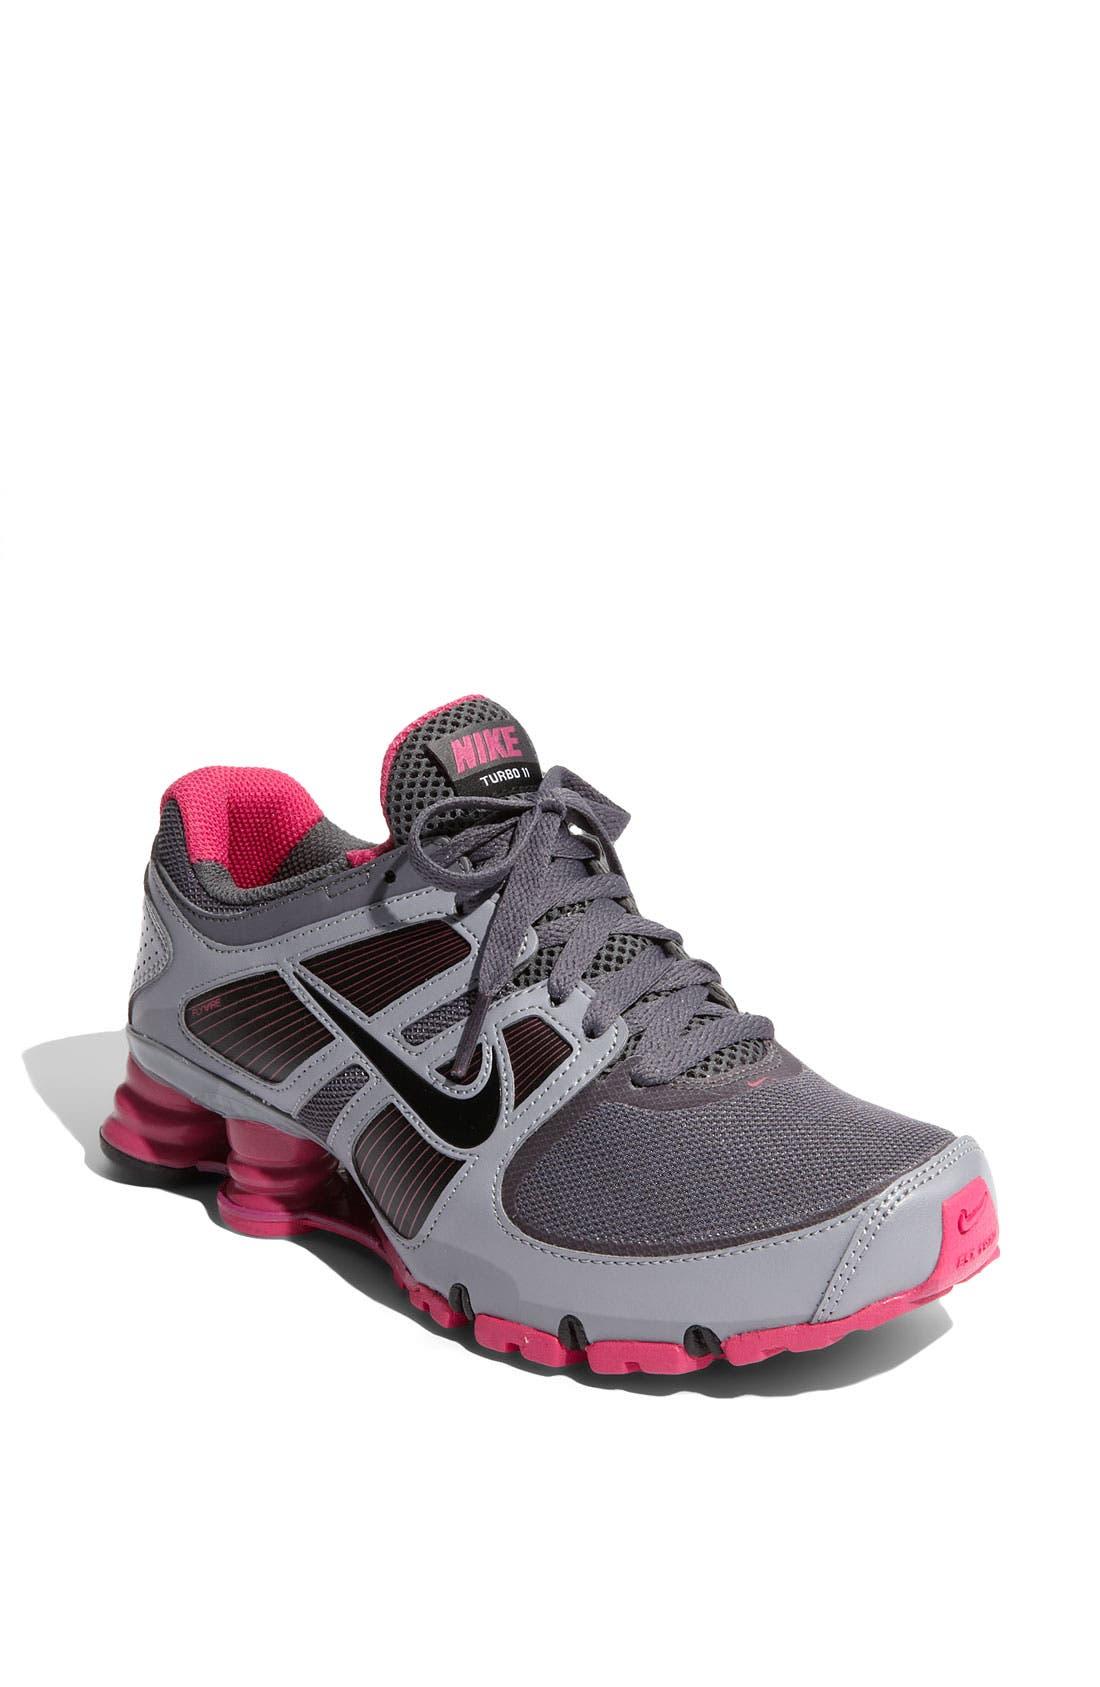 sneakers for cheap d6cbc 56d52 nike shox turbo 11 big kids Shox Turbo Little Girls Running Shoes TDV Kids White  Purple ...